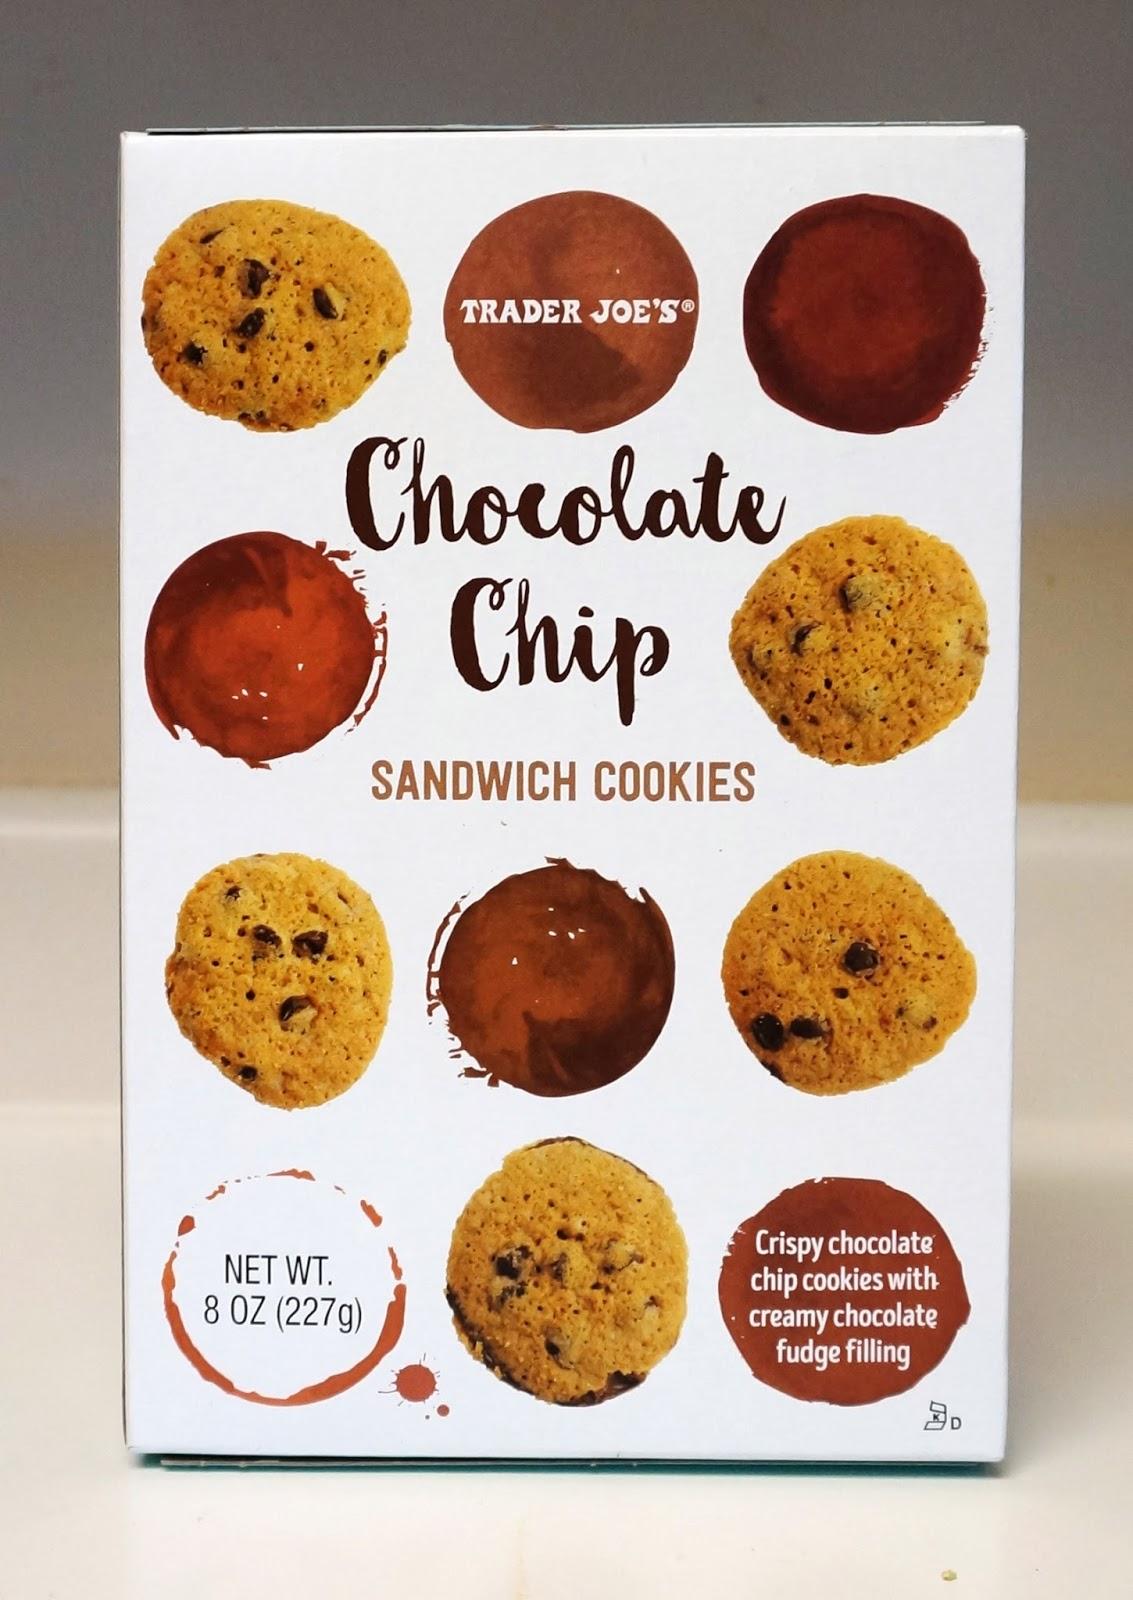 Exploring Trader Joe's: Trader Joe's Chocolate Chip Sandwich Cookies